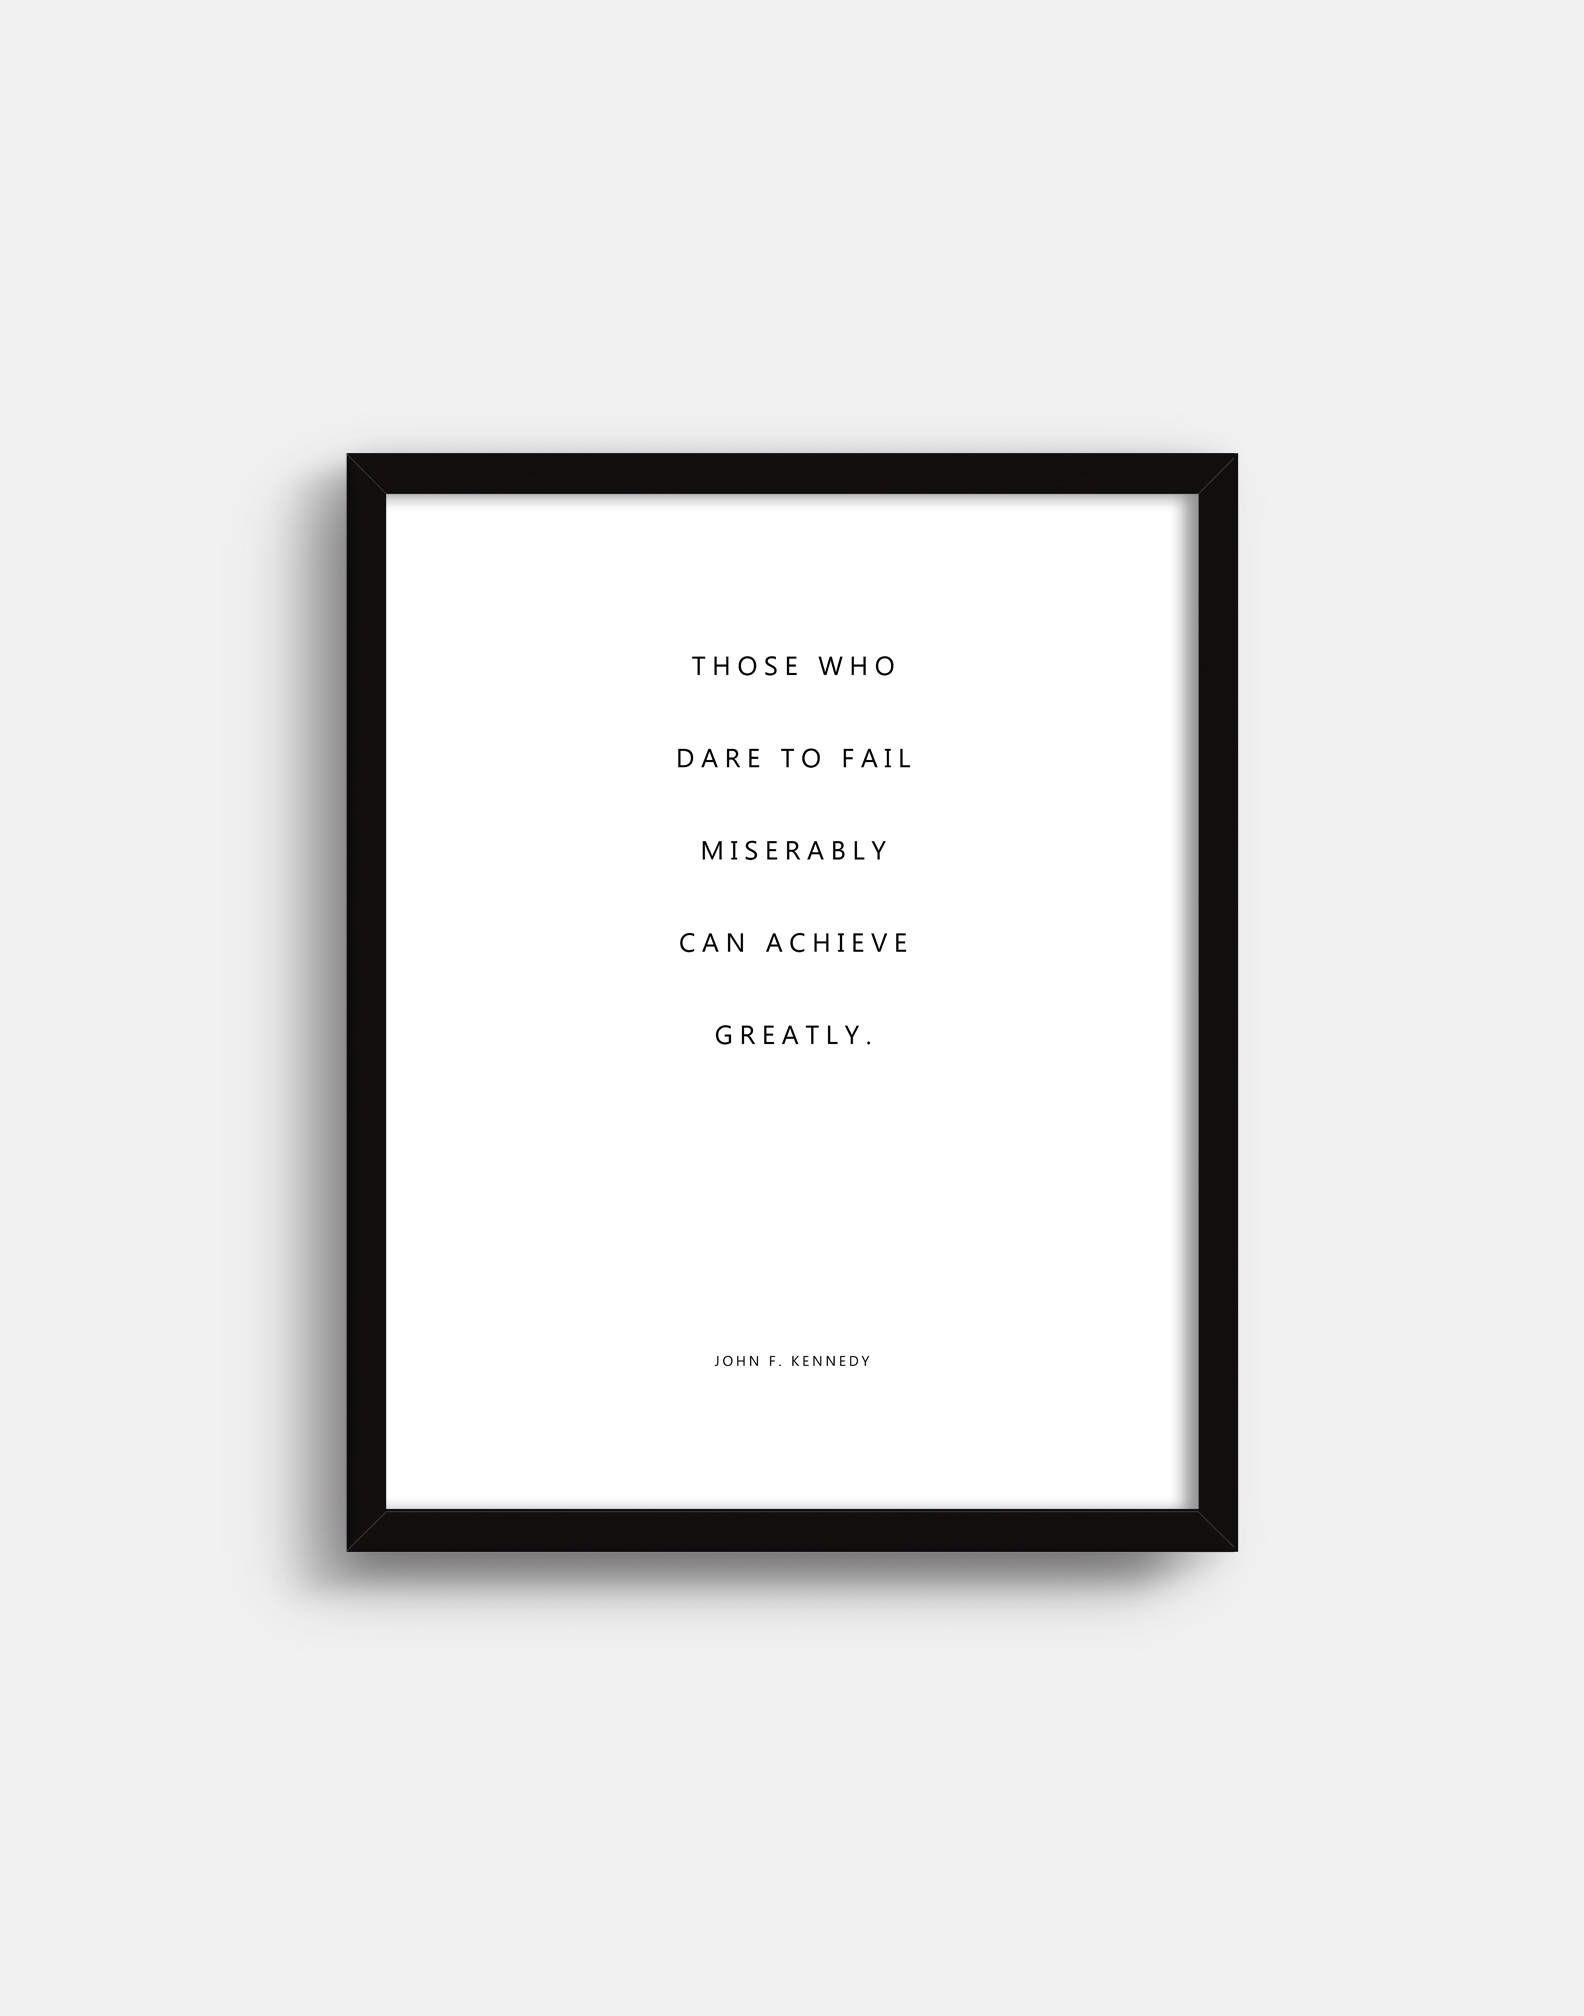 John F Kennedy Inspirational Quote Print Jfk Quote Modern Etsy Inspirational Quotes Quote Prints Jfk Quotes